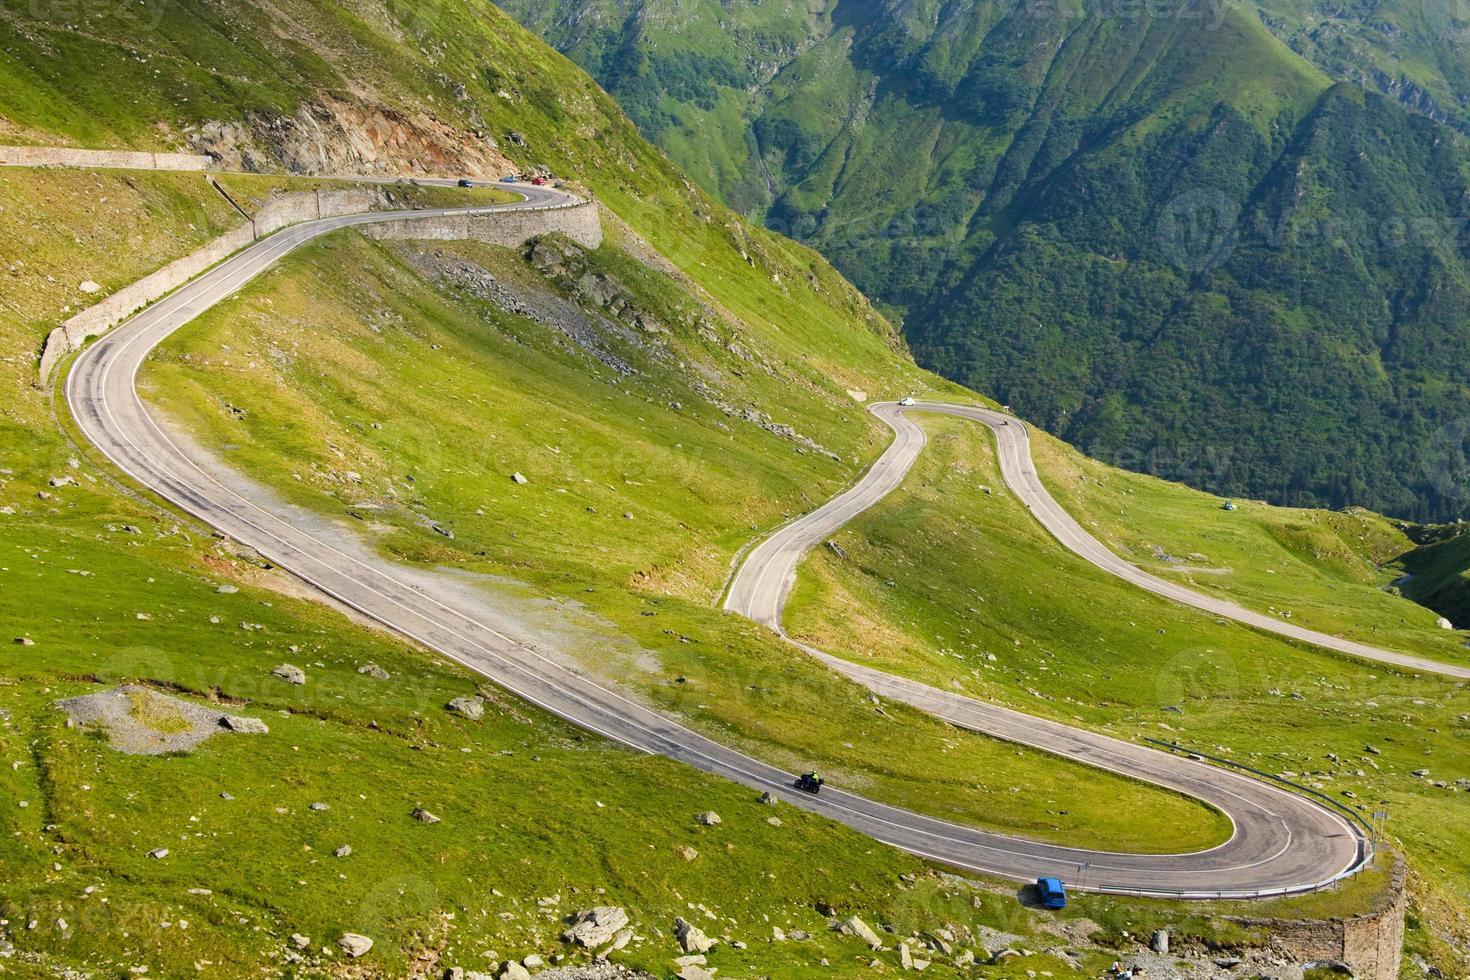 Transfagarasan mountain road, Romanian Carpathians photo